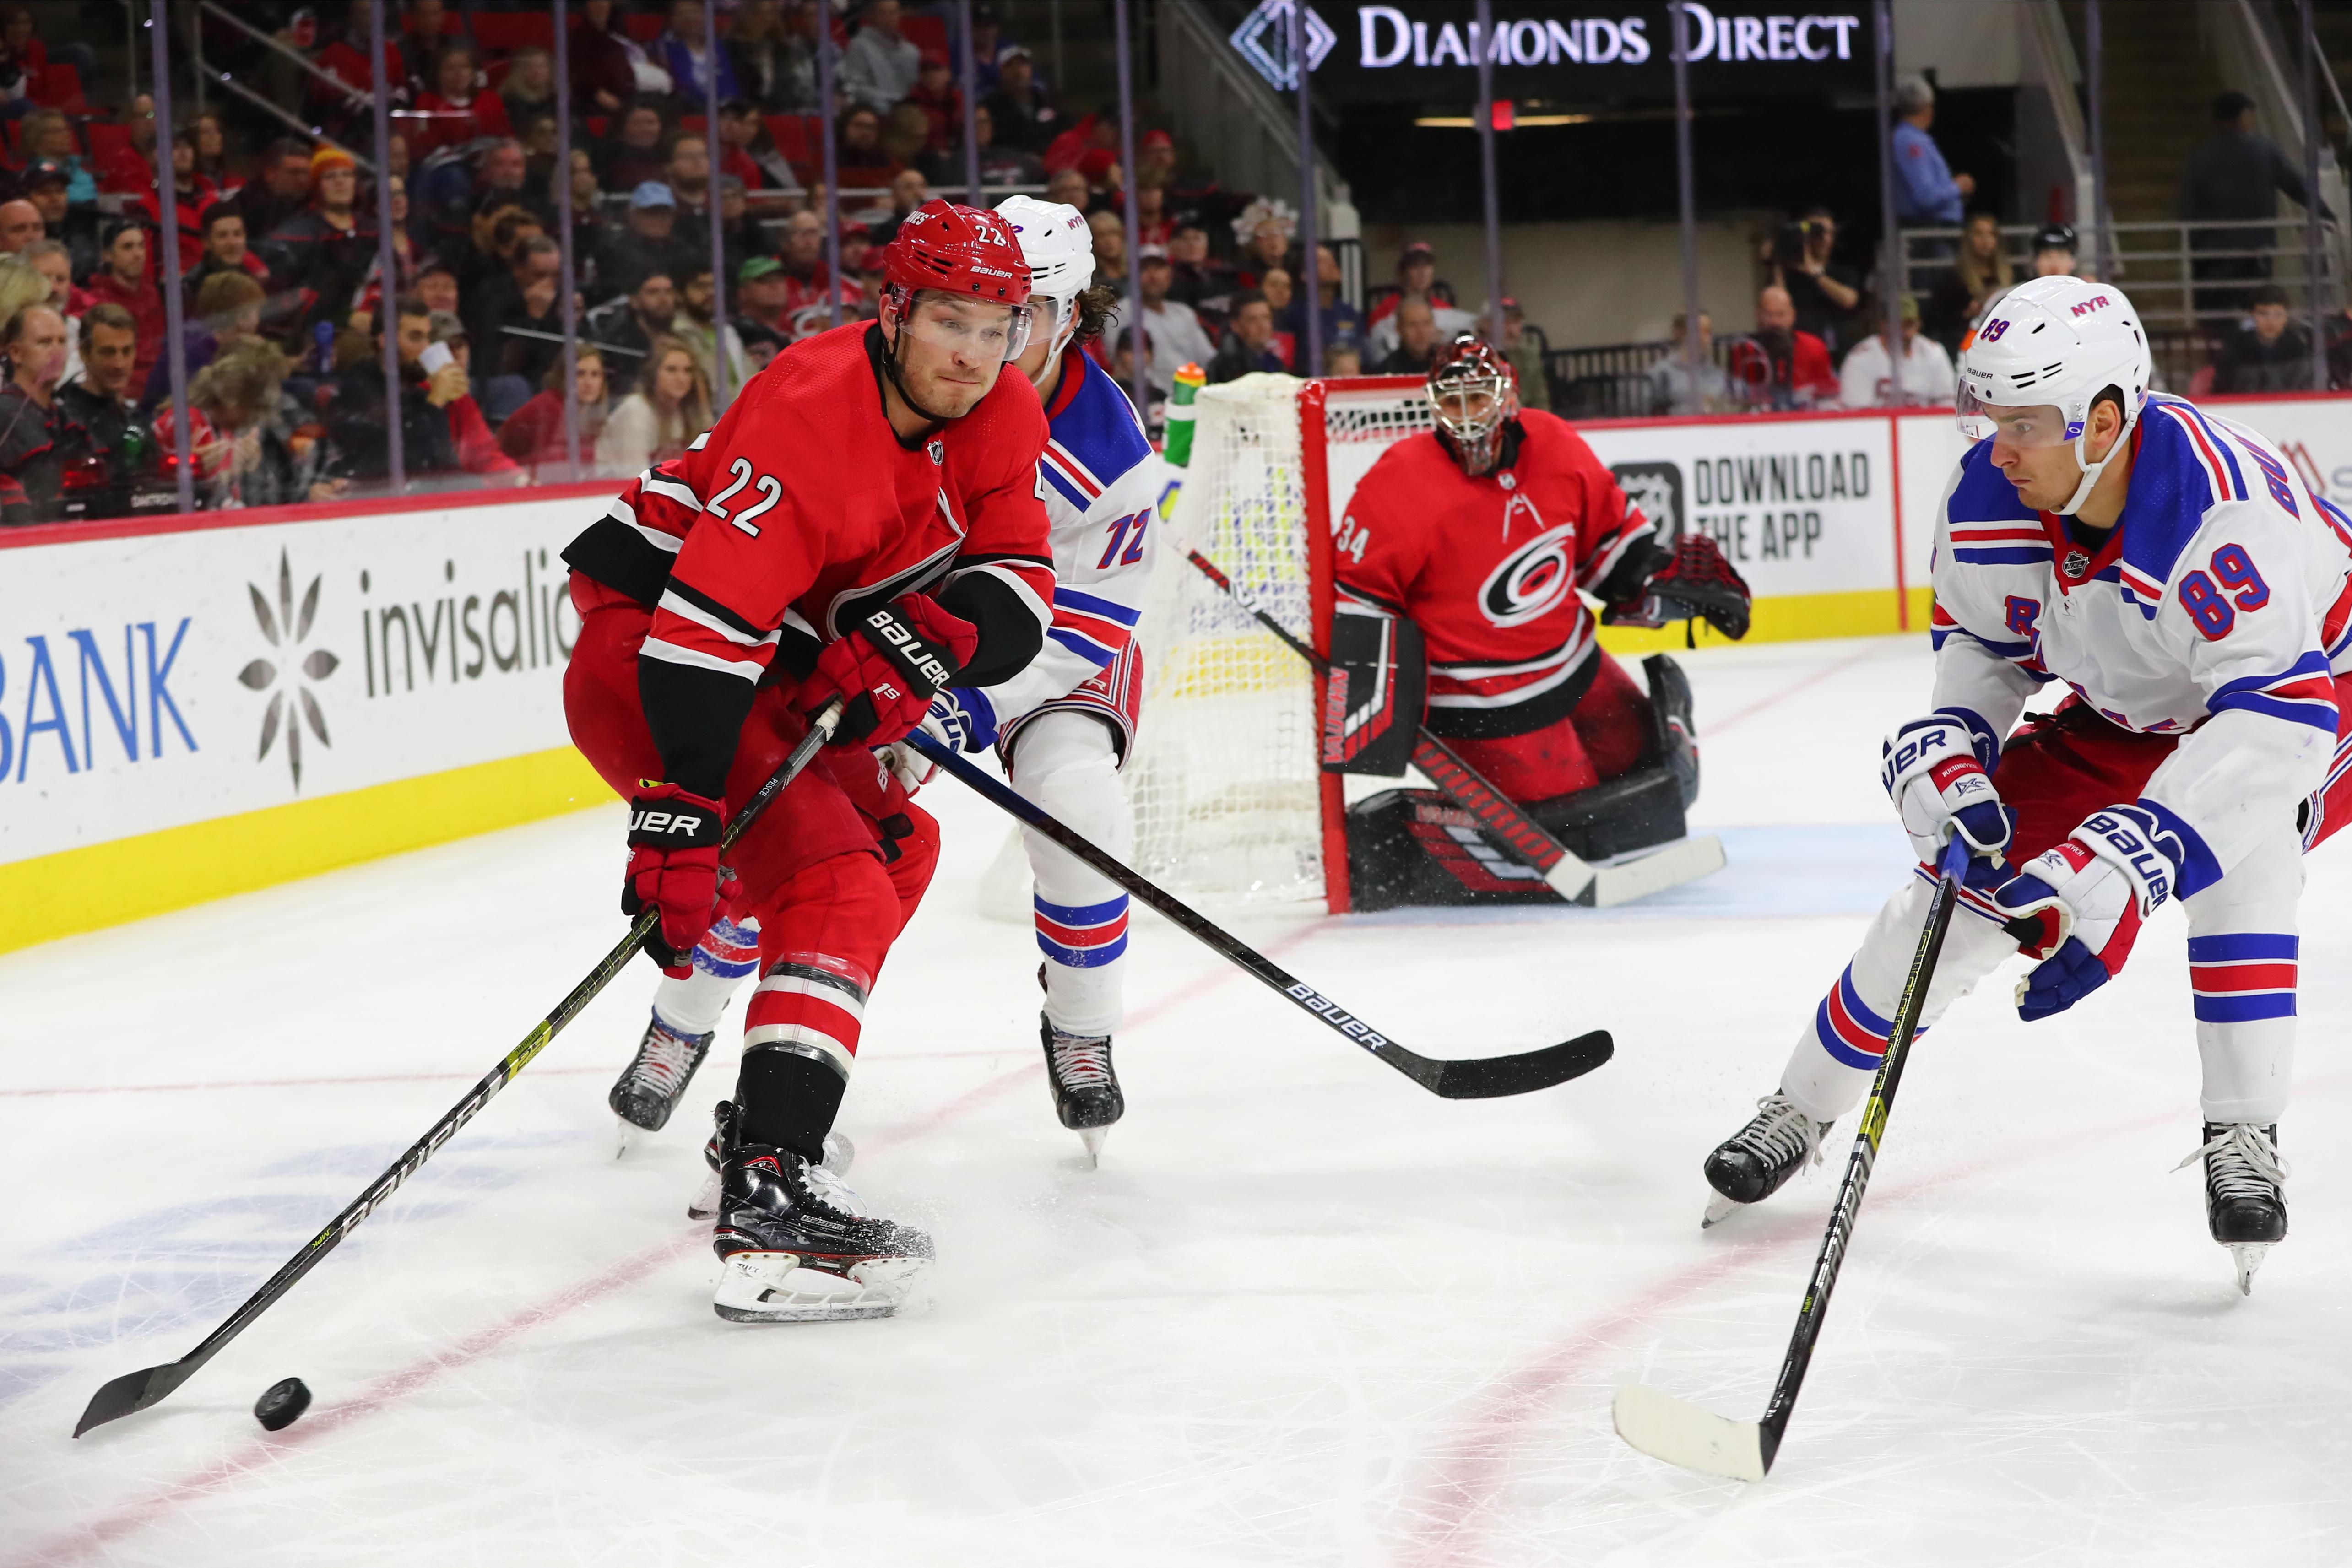 NHL: NOV 07 Rangers at Hurricanes